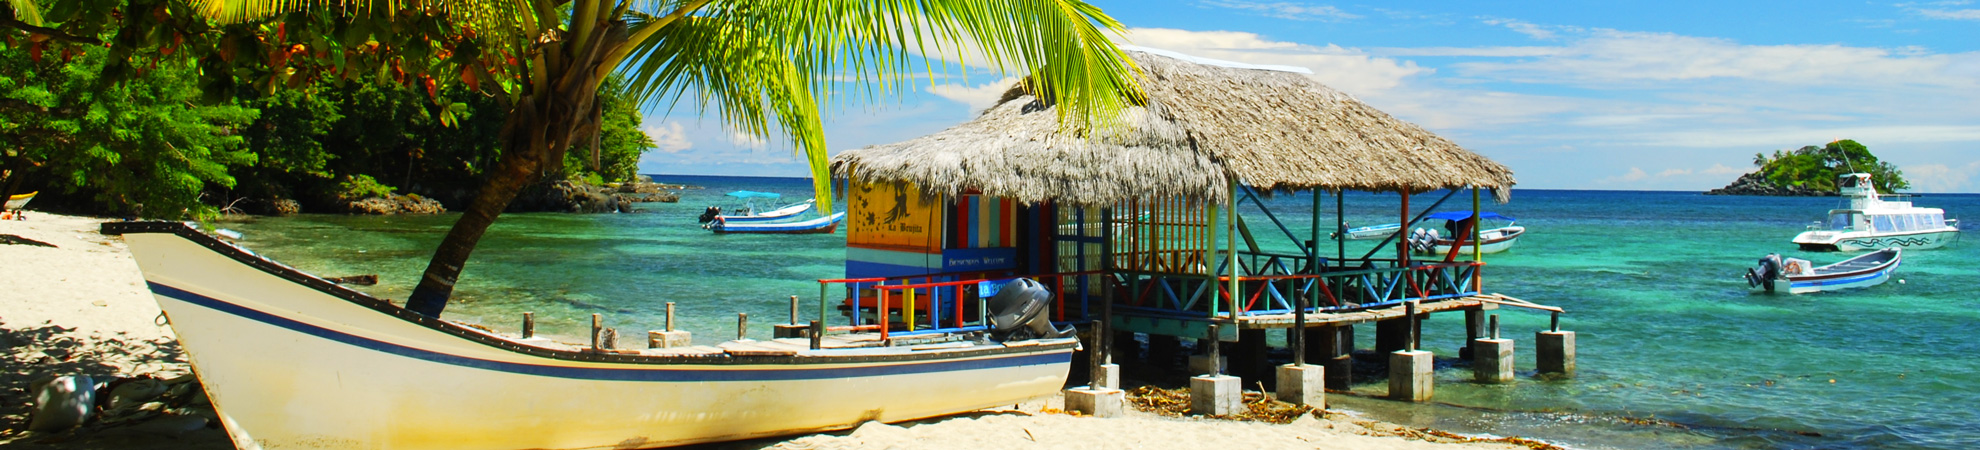 Organisez votre séjour Costa Rica